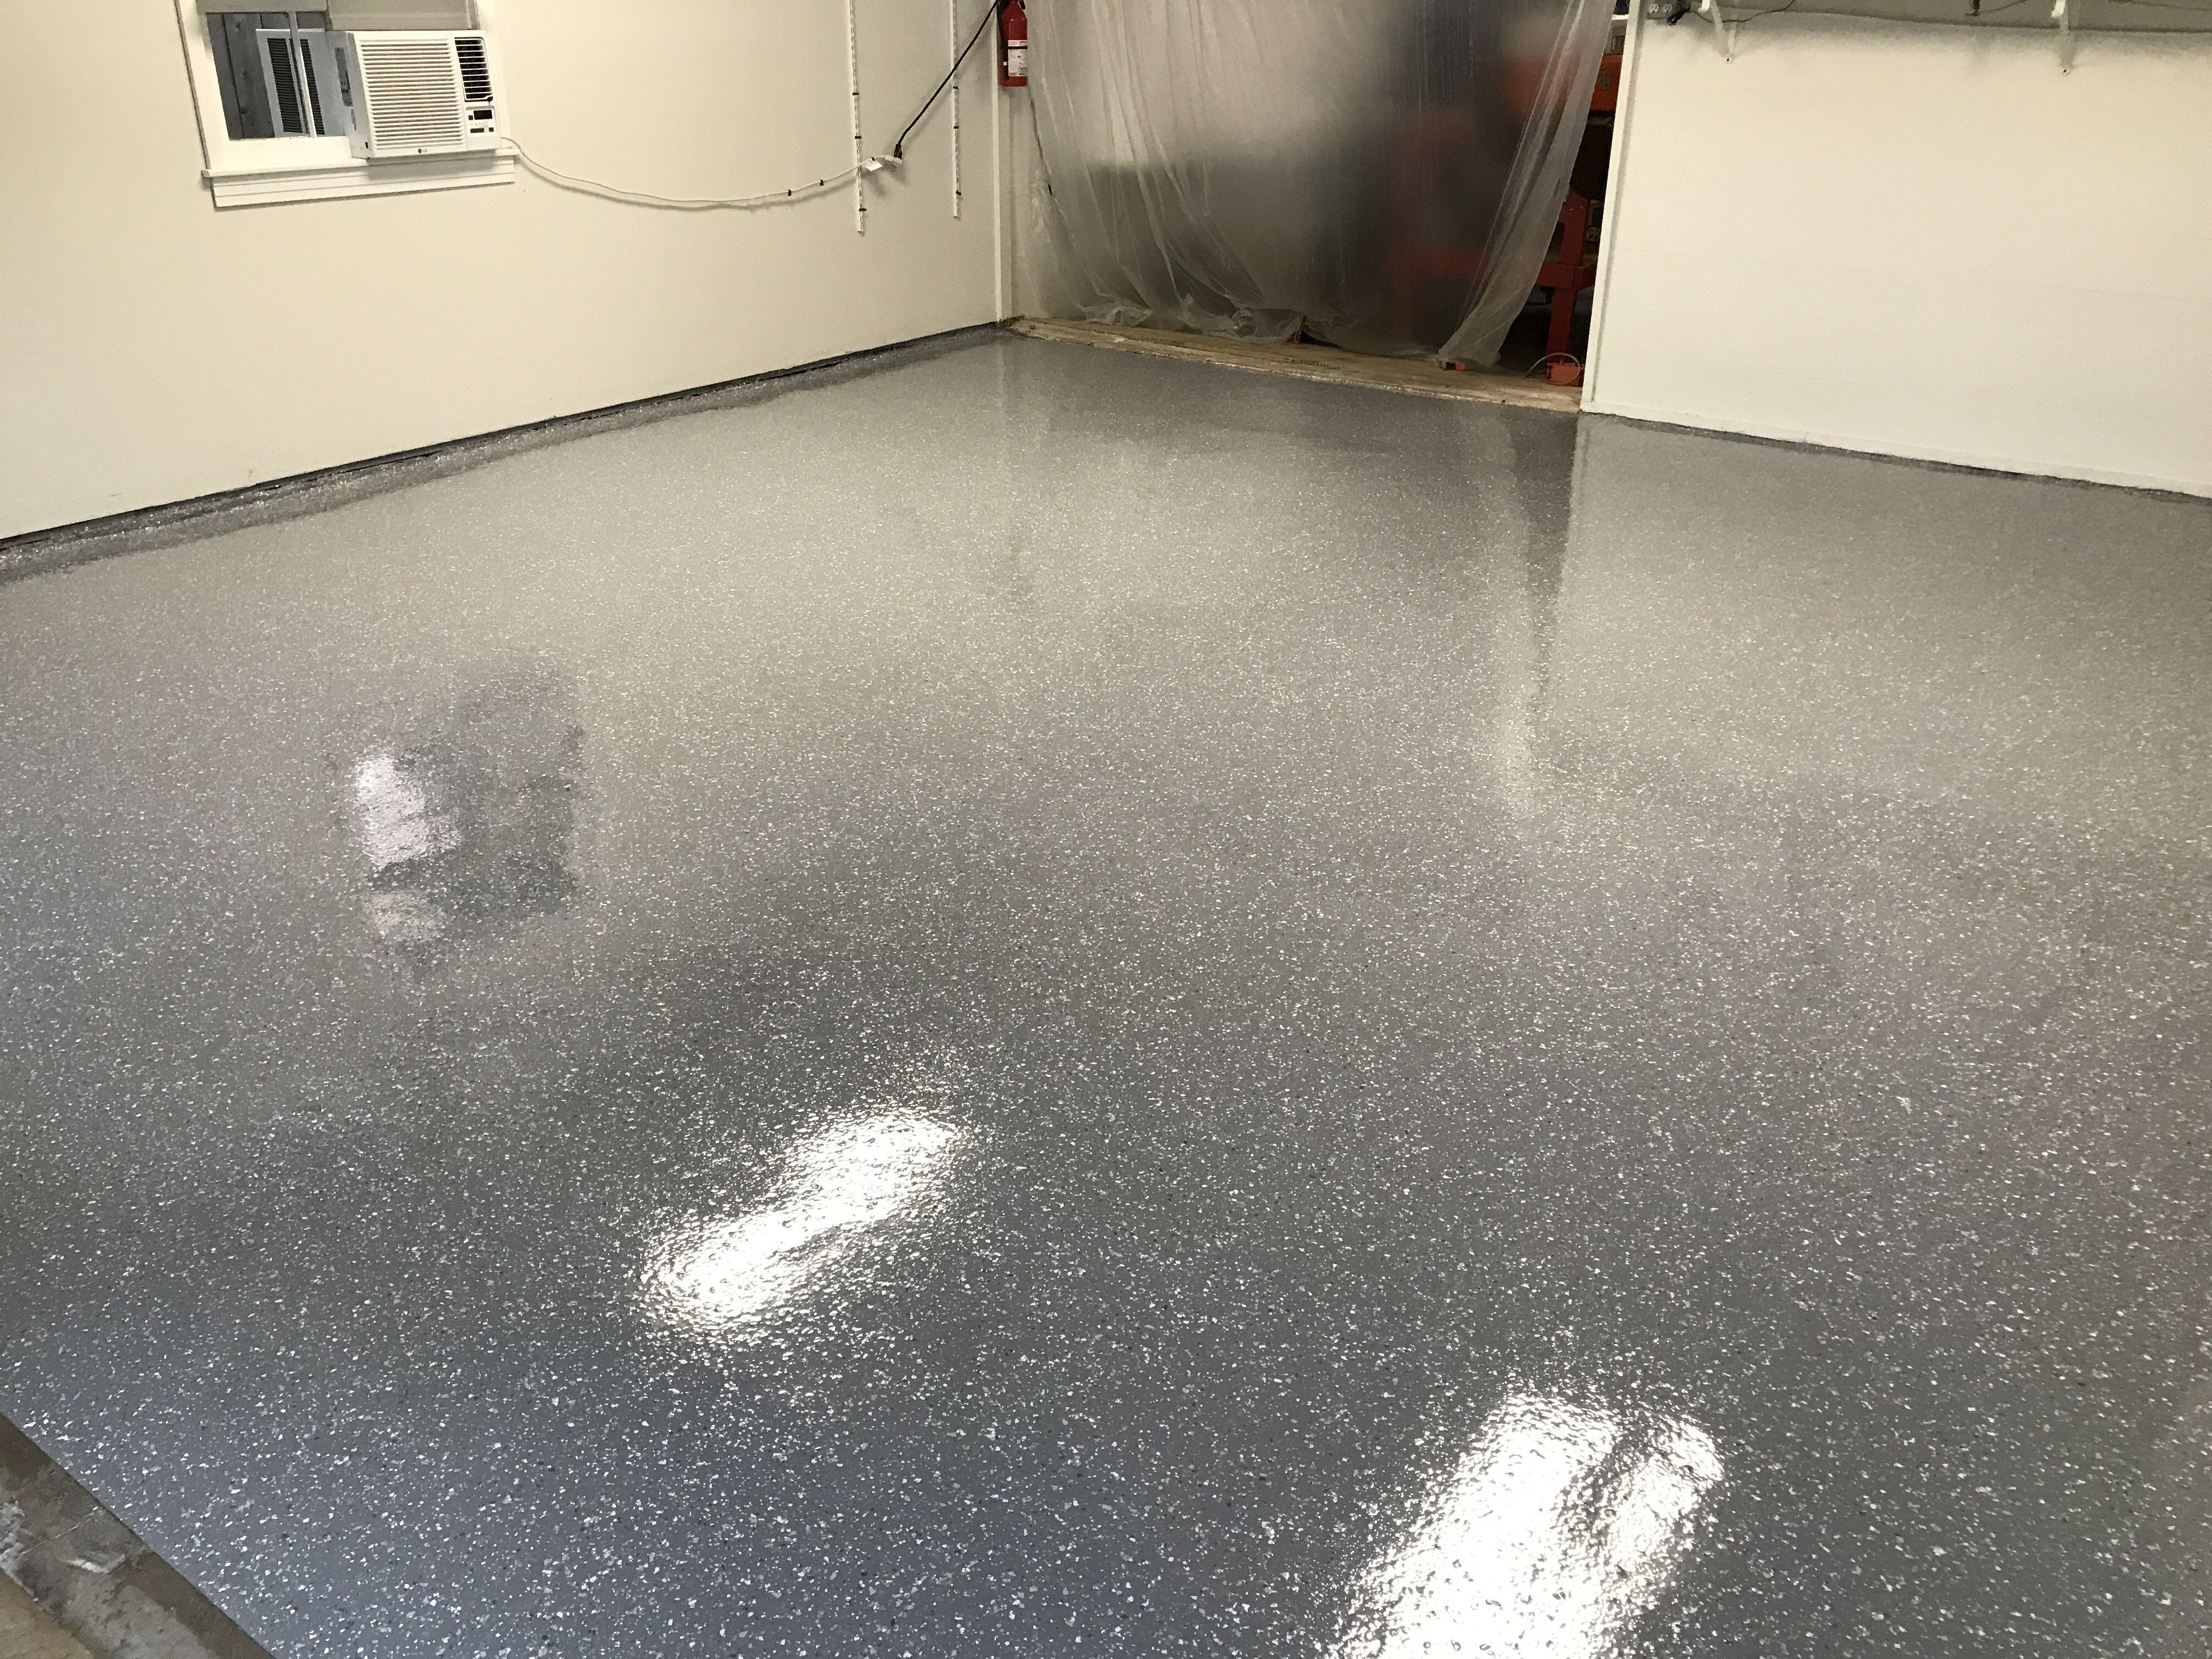 Basic Moonstone Polyaspartic Epoxy Garage Floor Garage Floor Epoxy Flooring Floor Coating